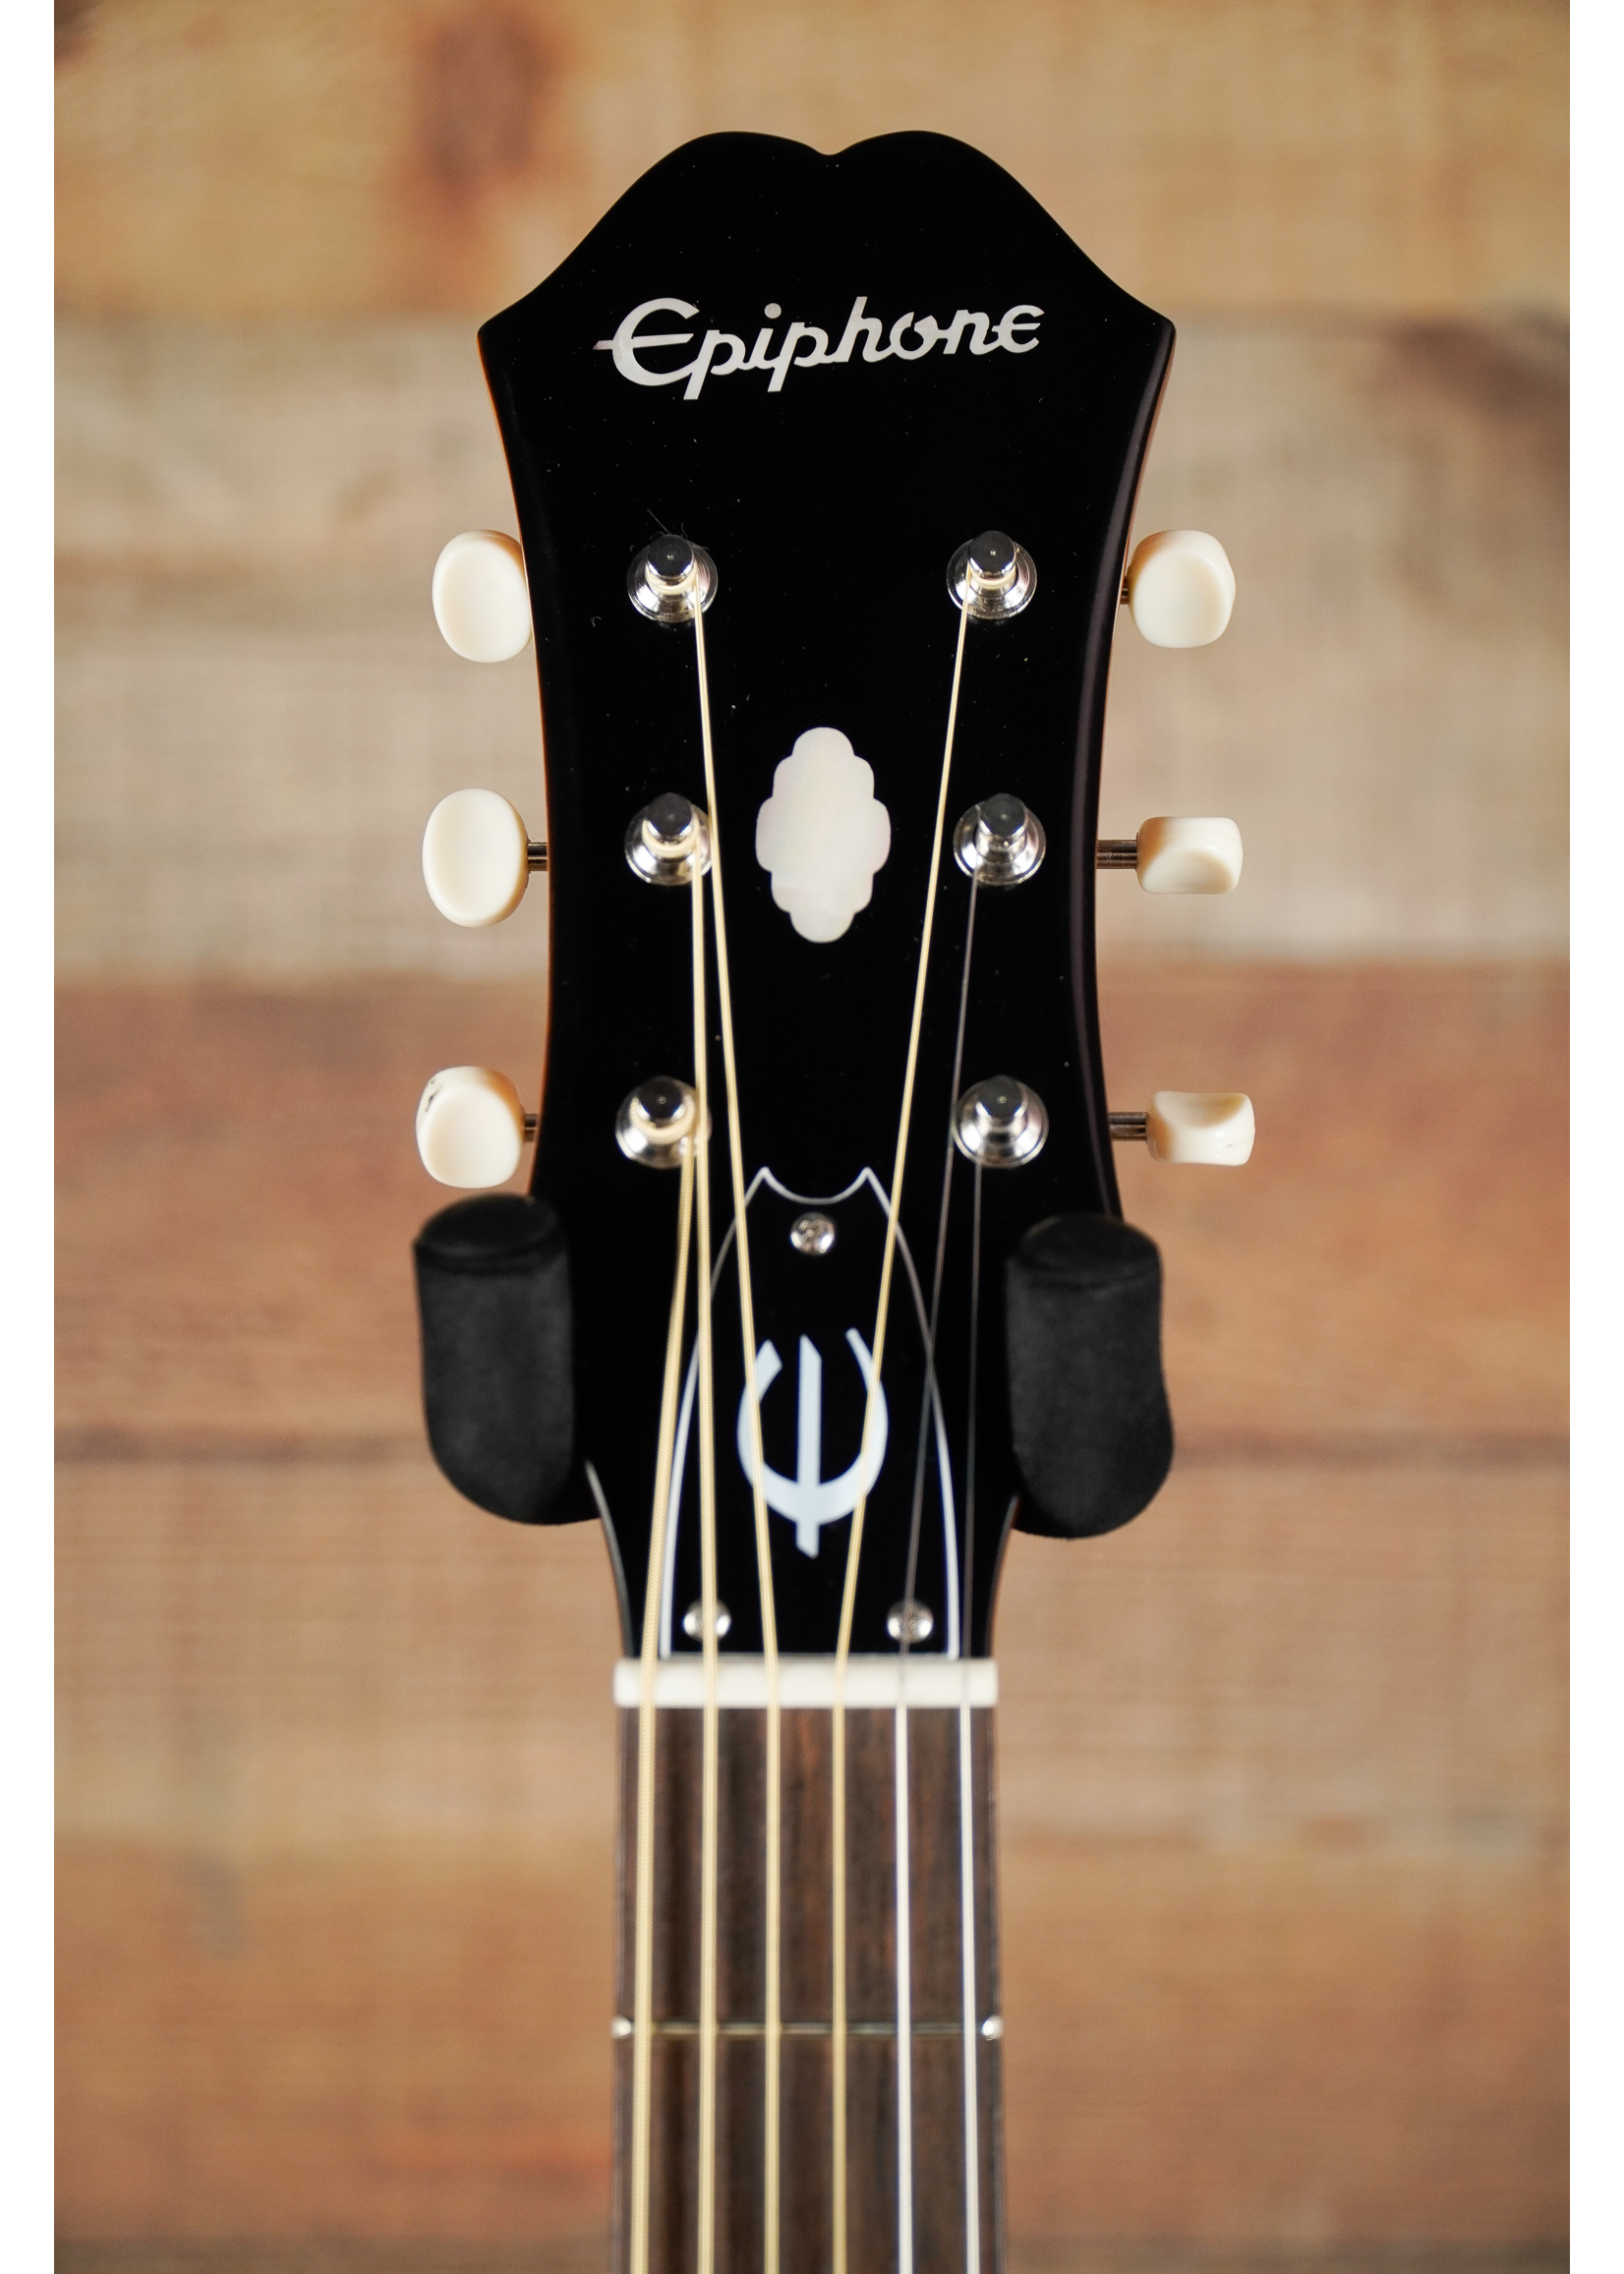 Epiphone Epiphone Masterbilt Texan Antique Natural Aged Gloss